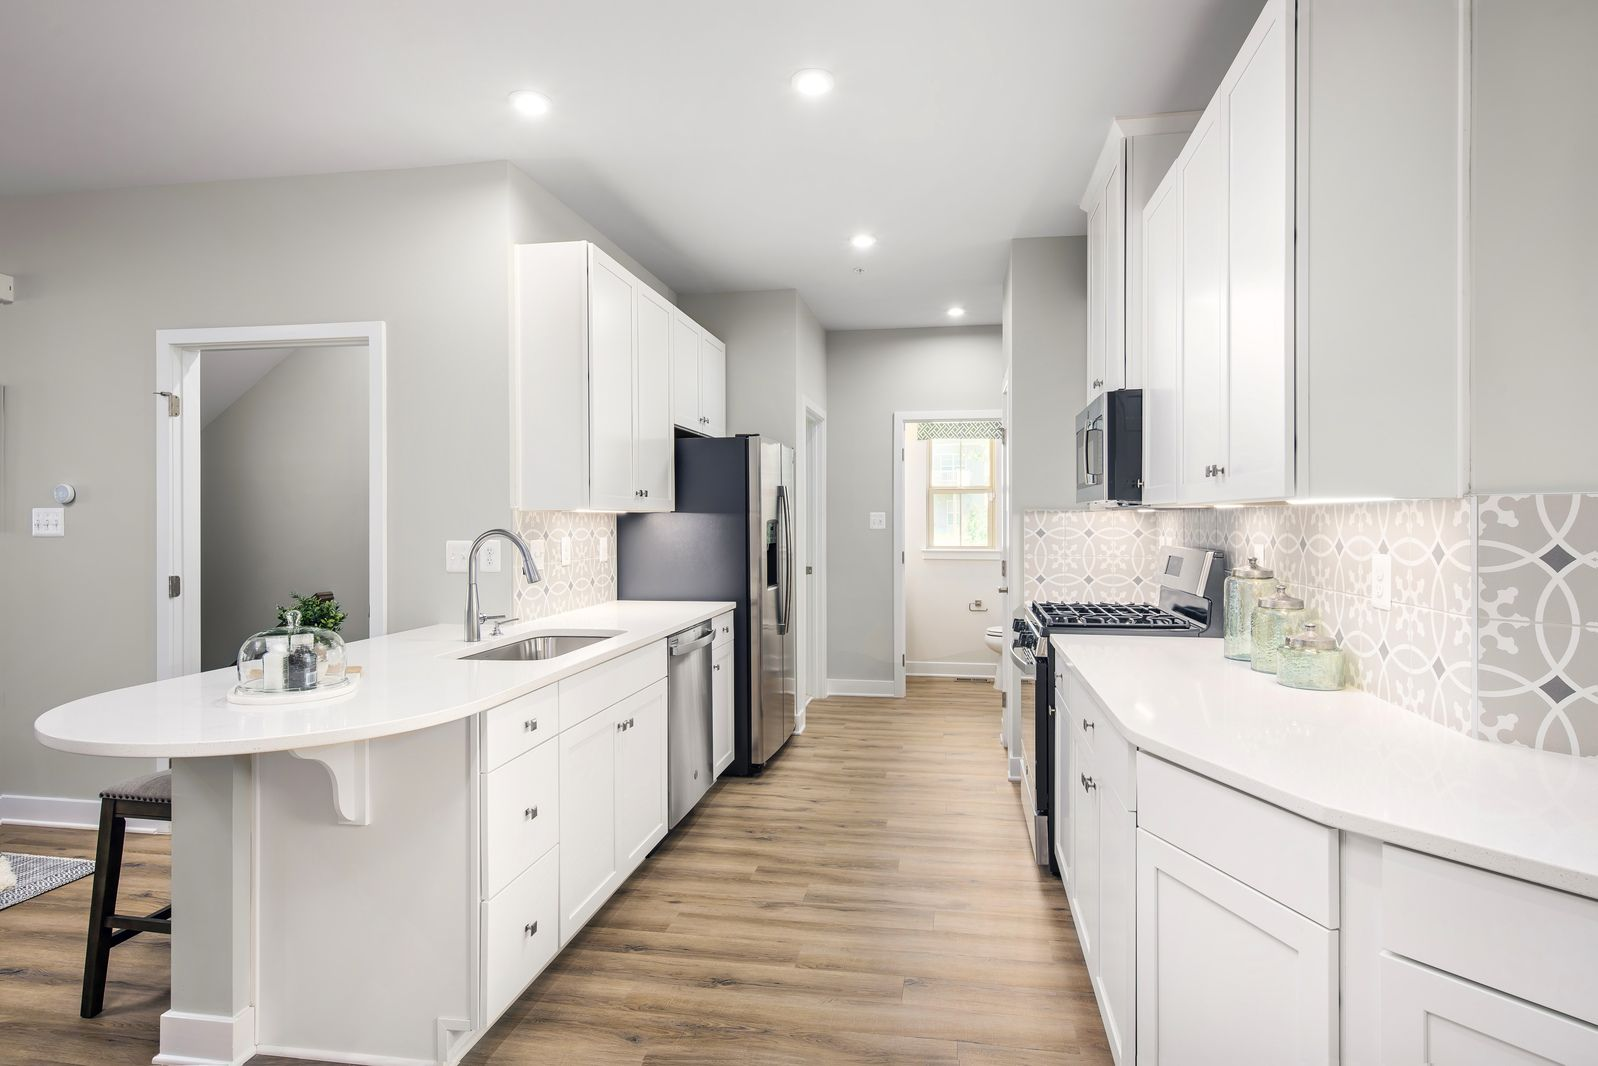 Kitchen featured in the Calvert By Ryan Homes in Warren County, NJ